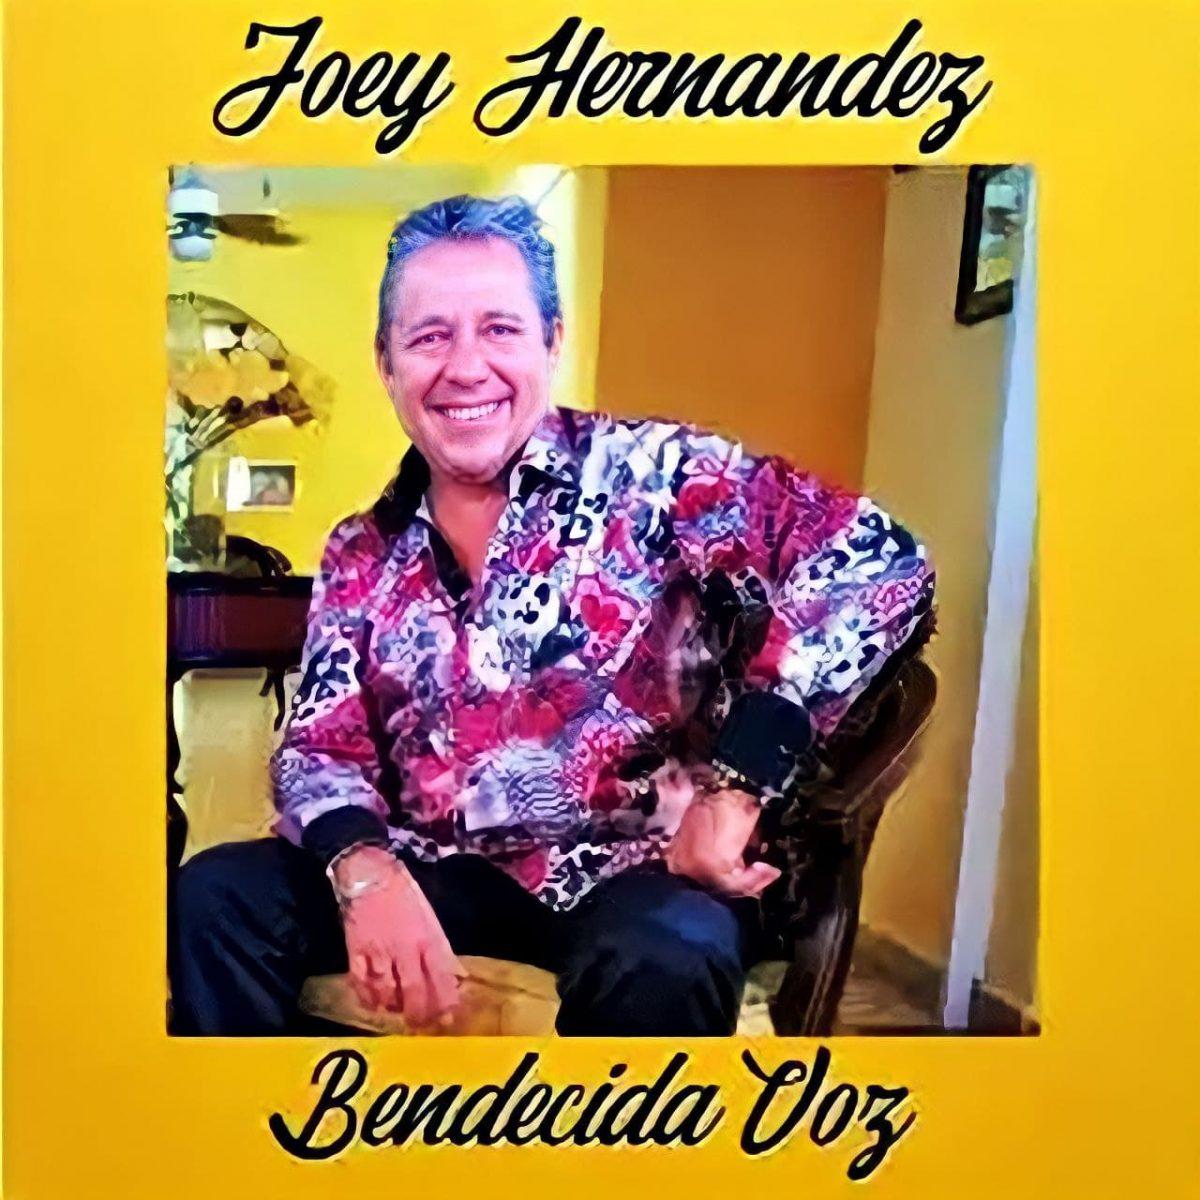 BENDECIDA VOZ (Homenaje A Ismael Miranda) Joey Hernández